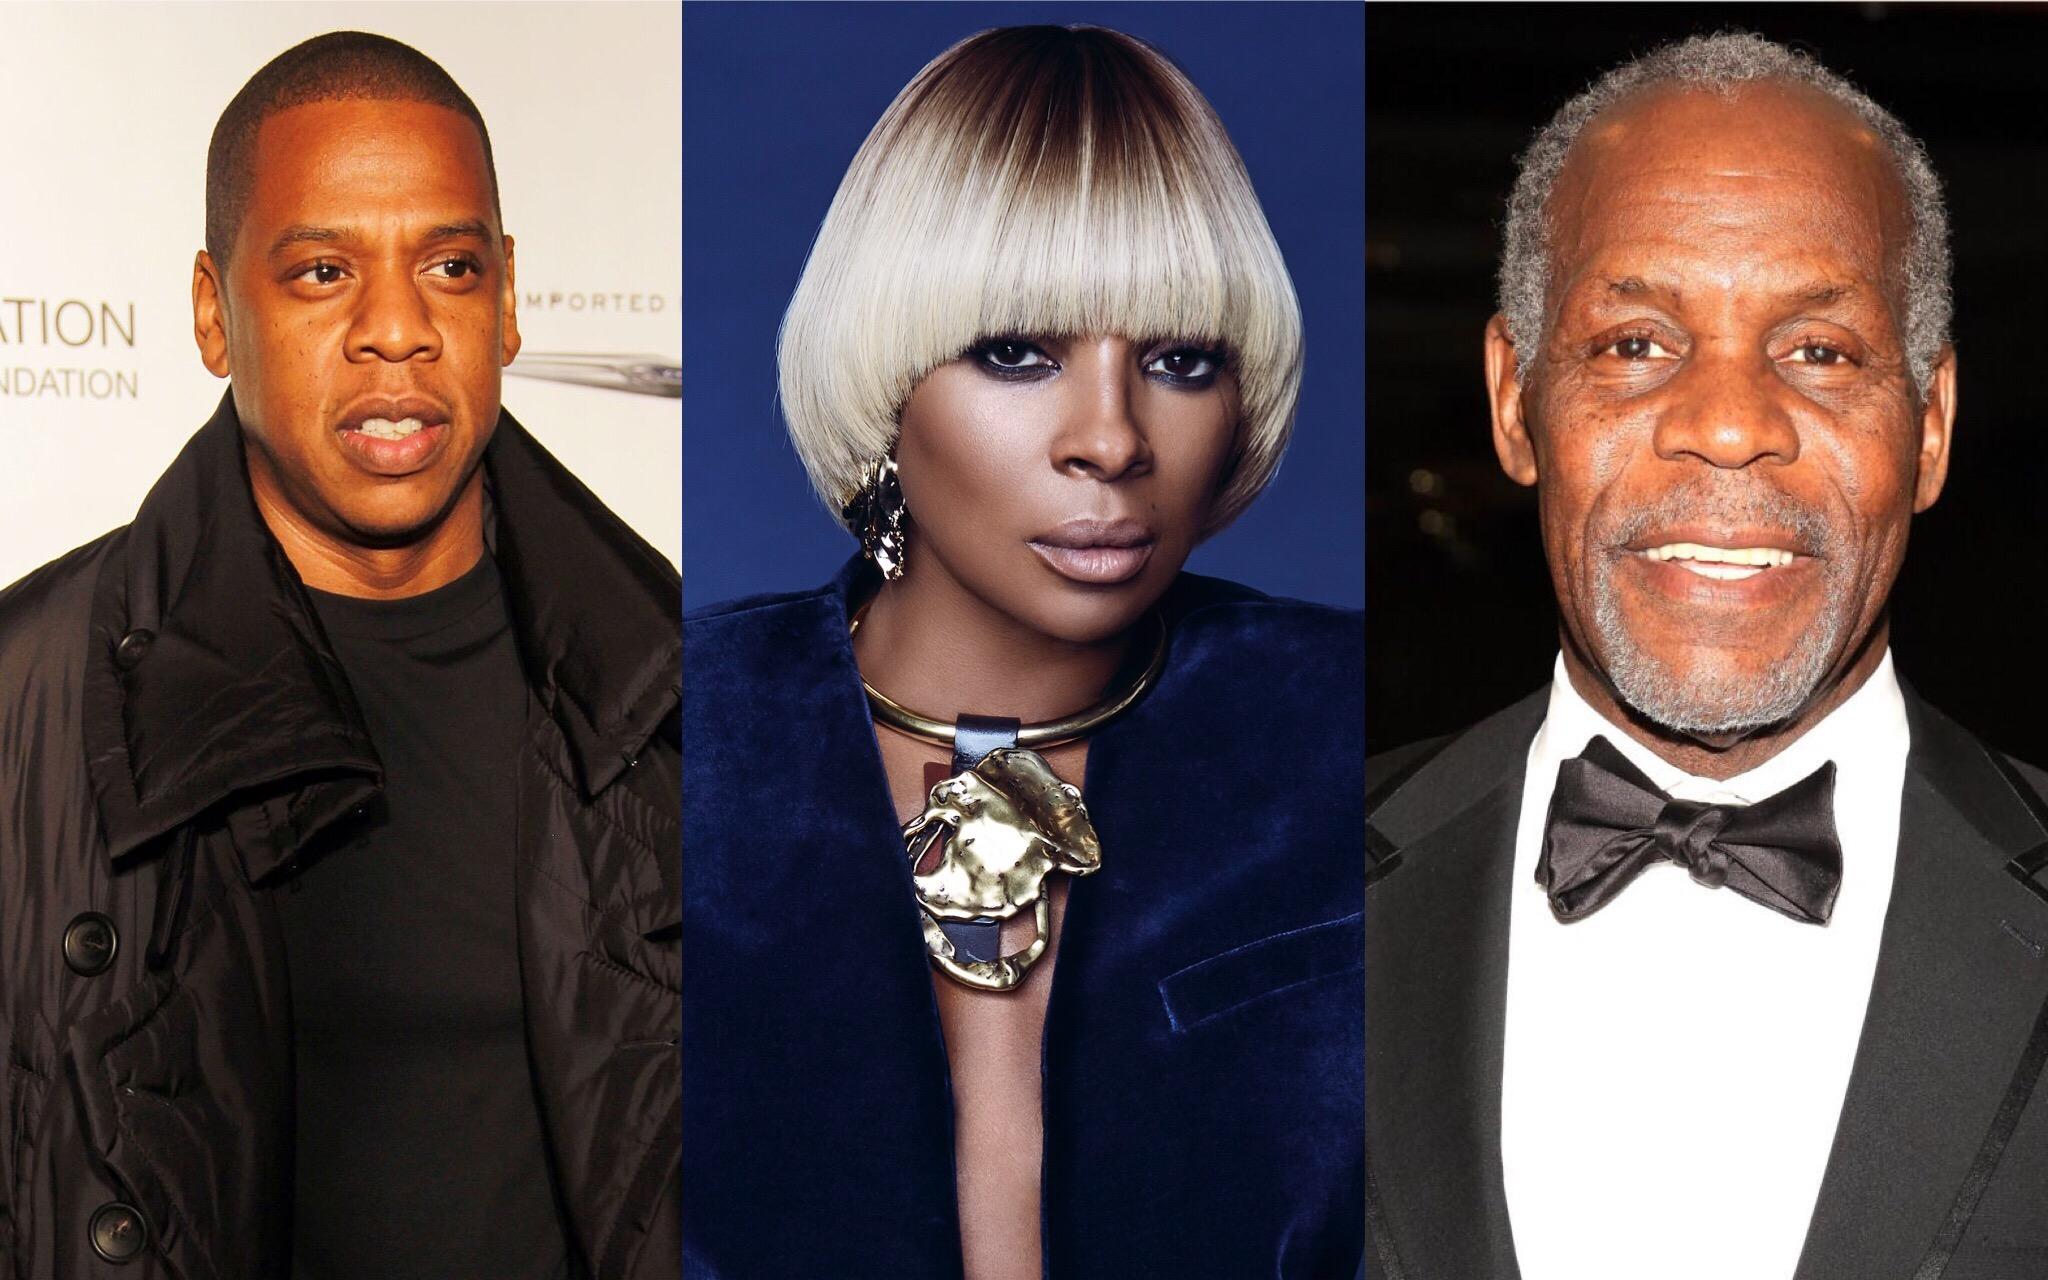 Jay Z Mary J Blige Danny Glover NAACP Image Awards